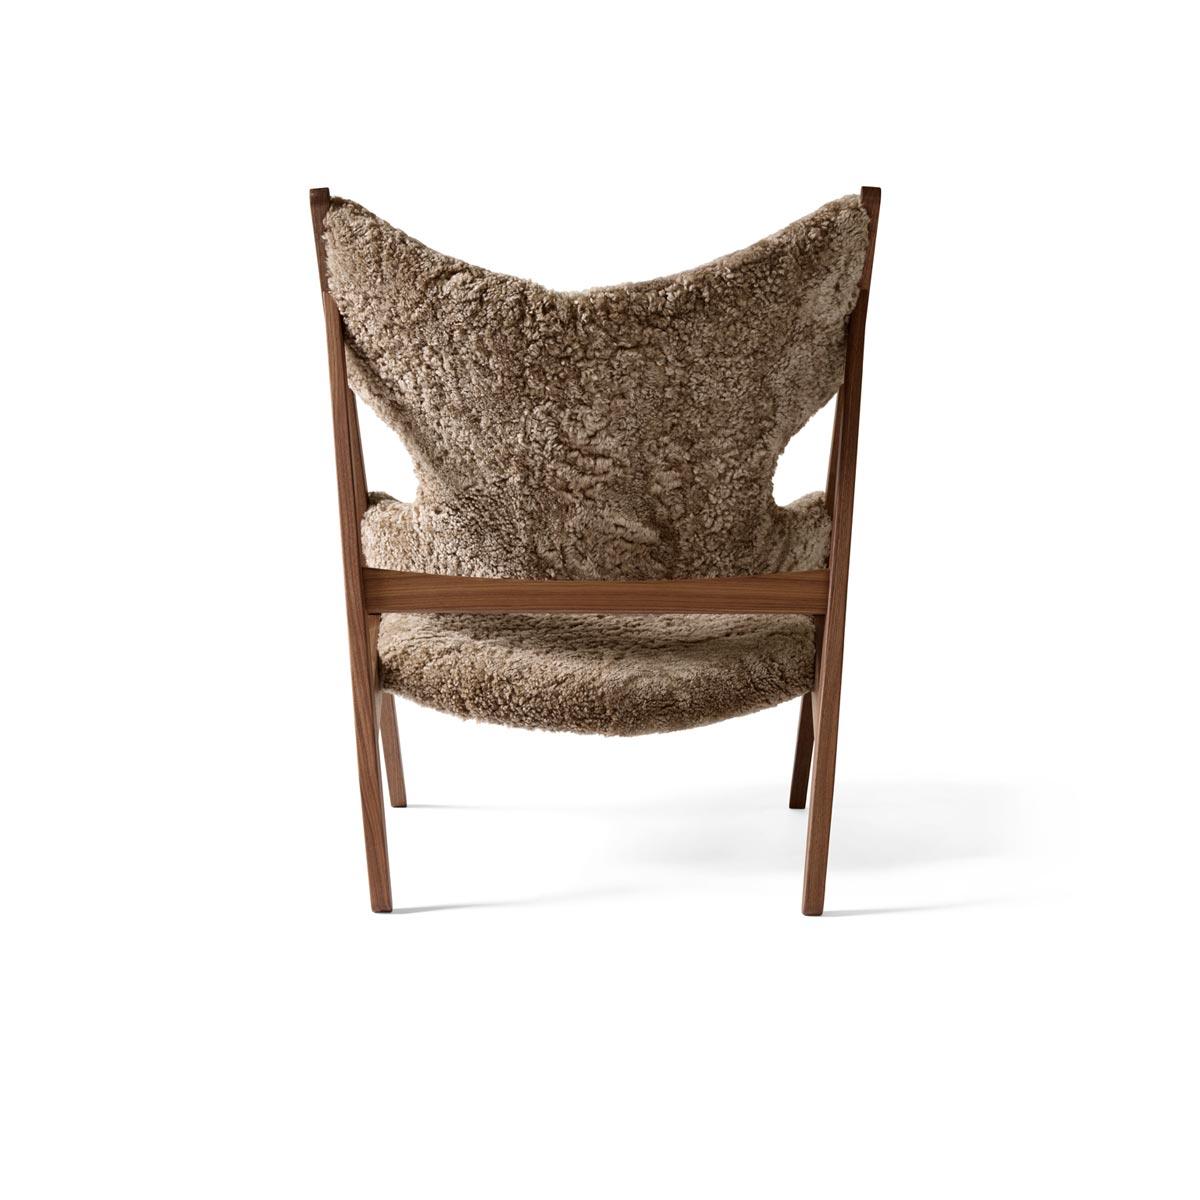 9682919 Knitting Lounge Chair Walnut Cork 19 Back 1